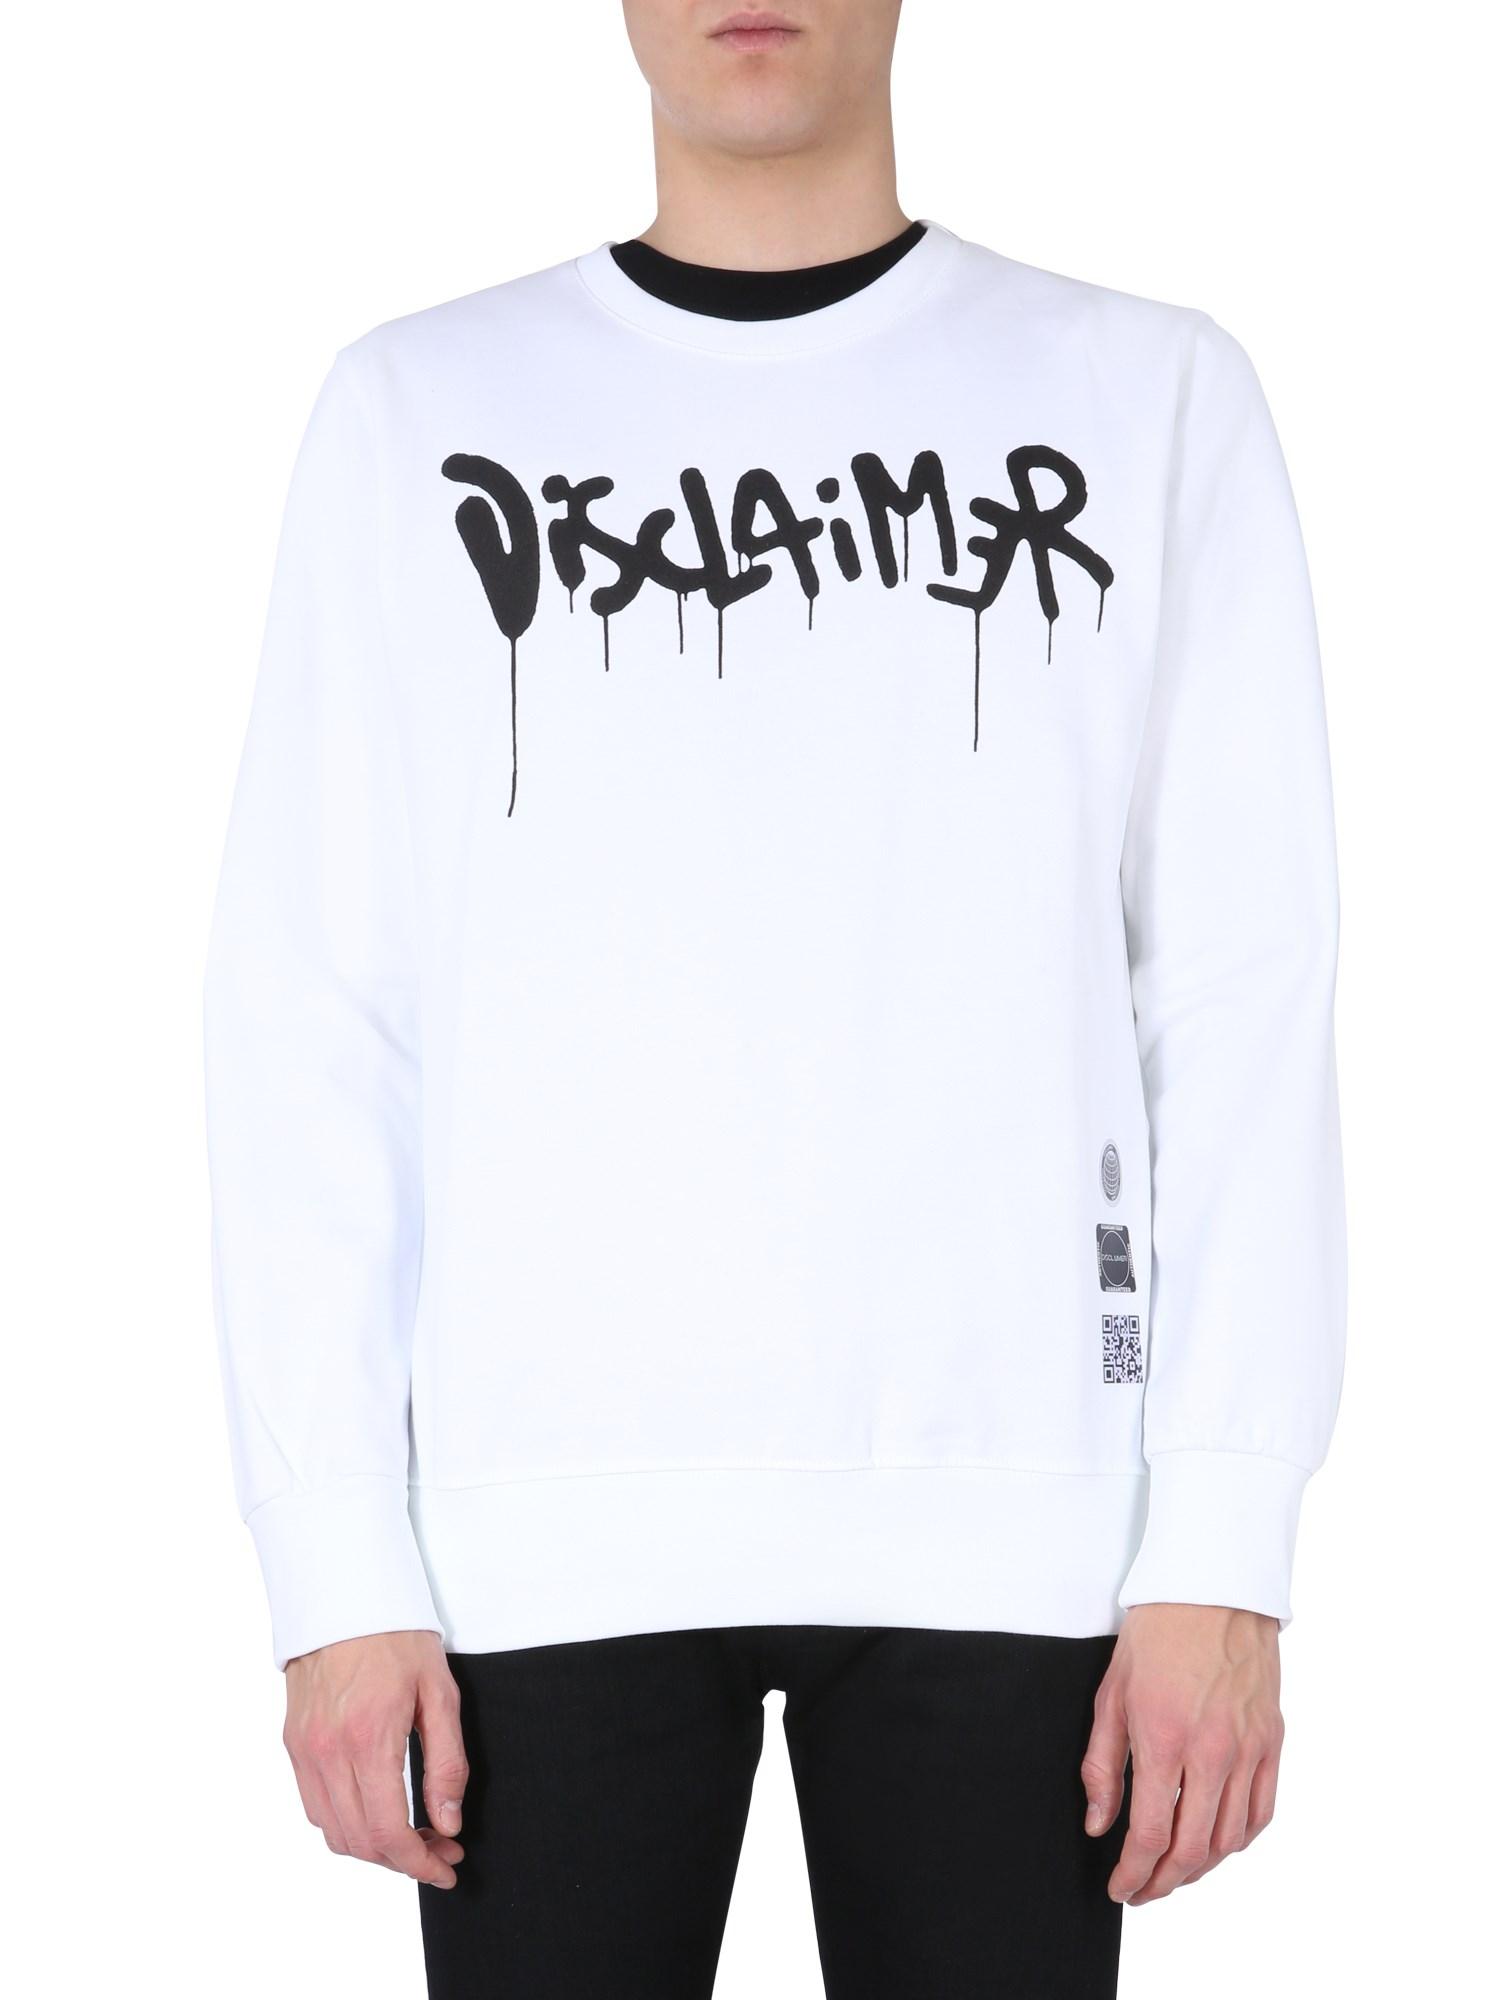 disclaimer long sleeve t-shirt